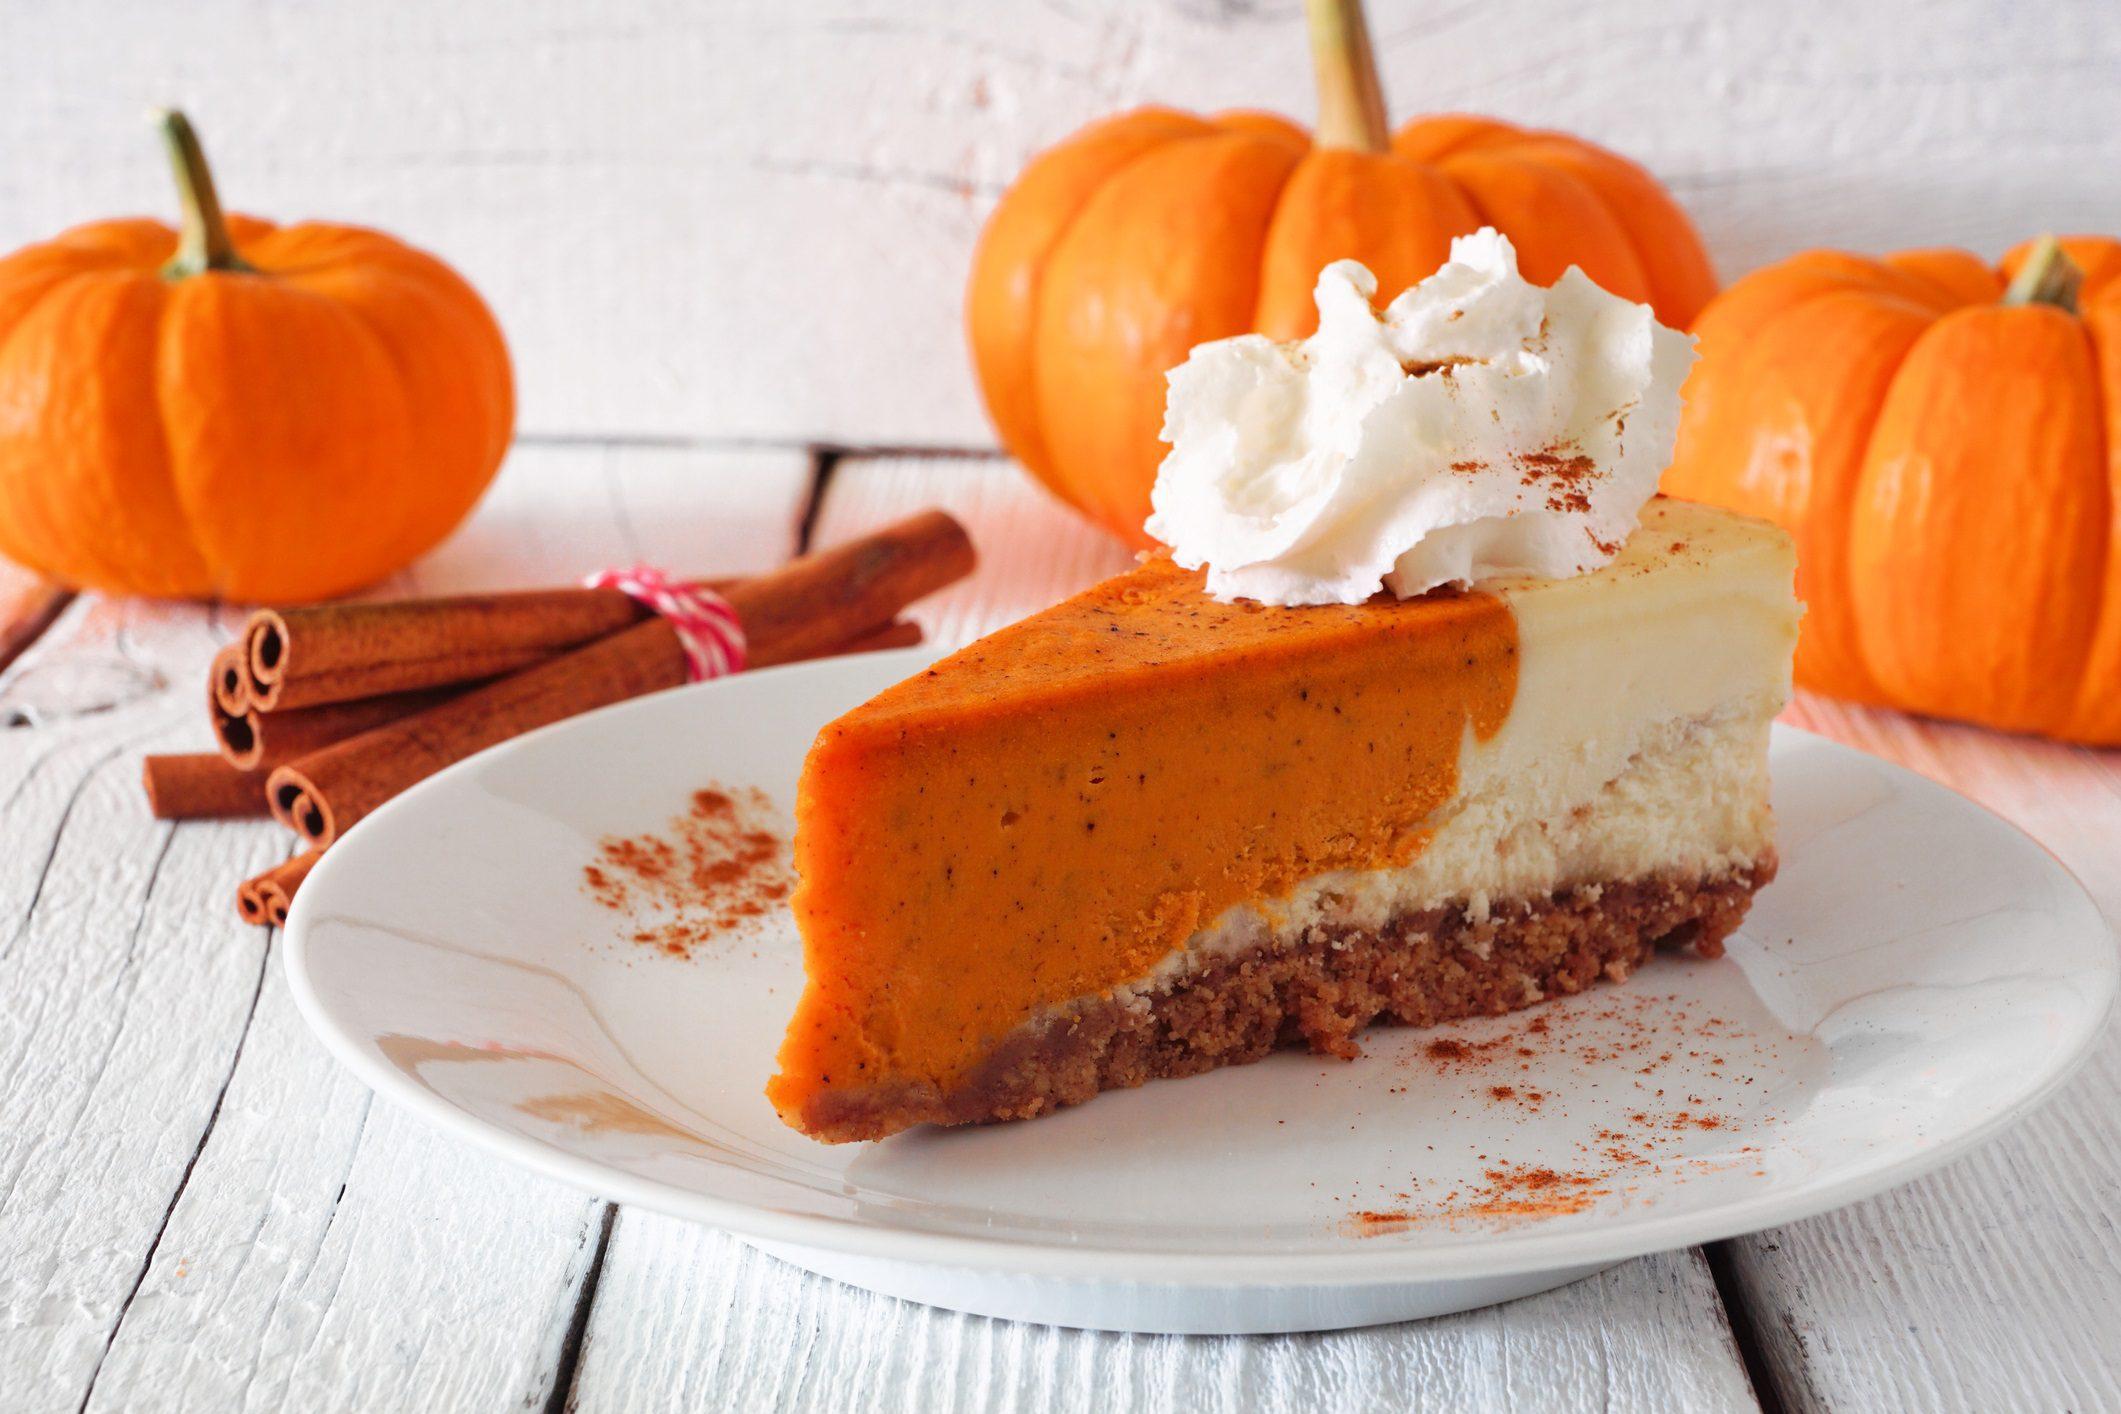 Pumpkin Cheesecake, Thanksgiving Day, Dinner Table, Fall, Pumpkins